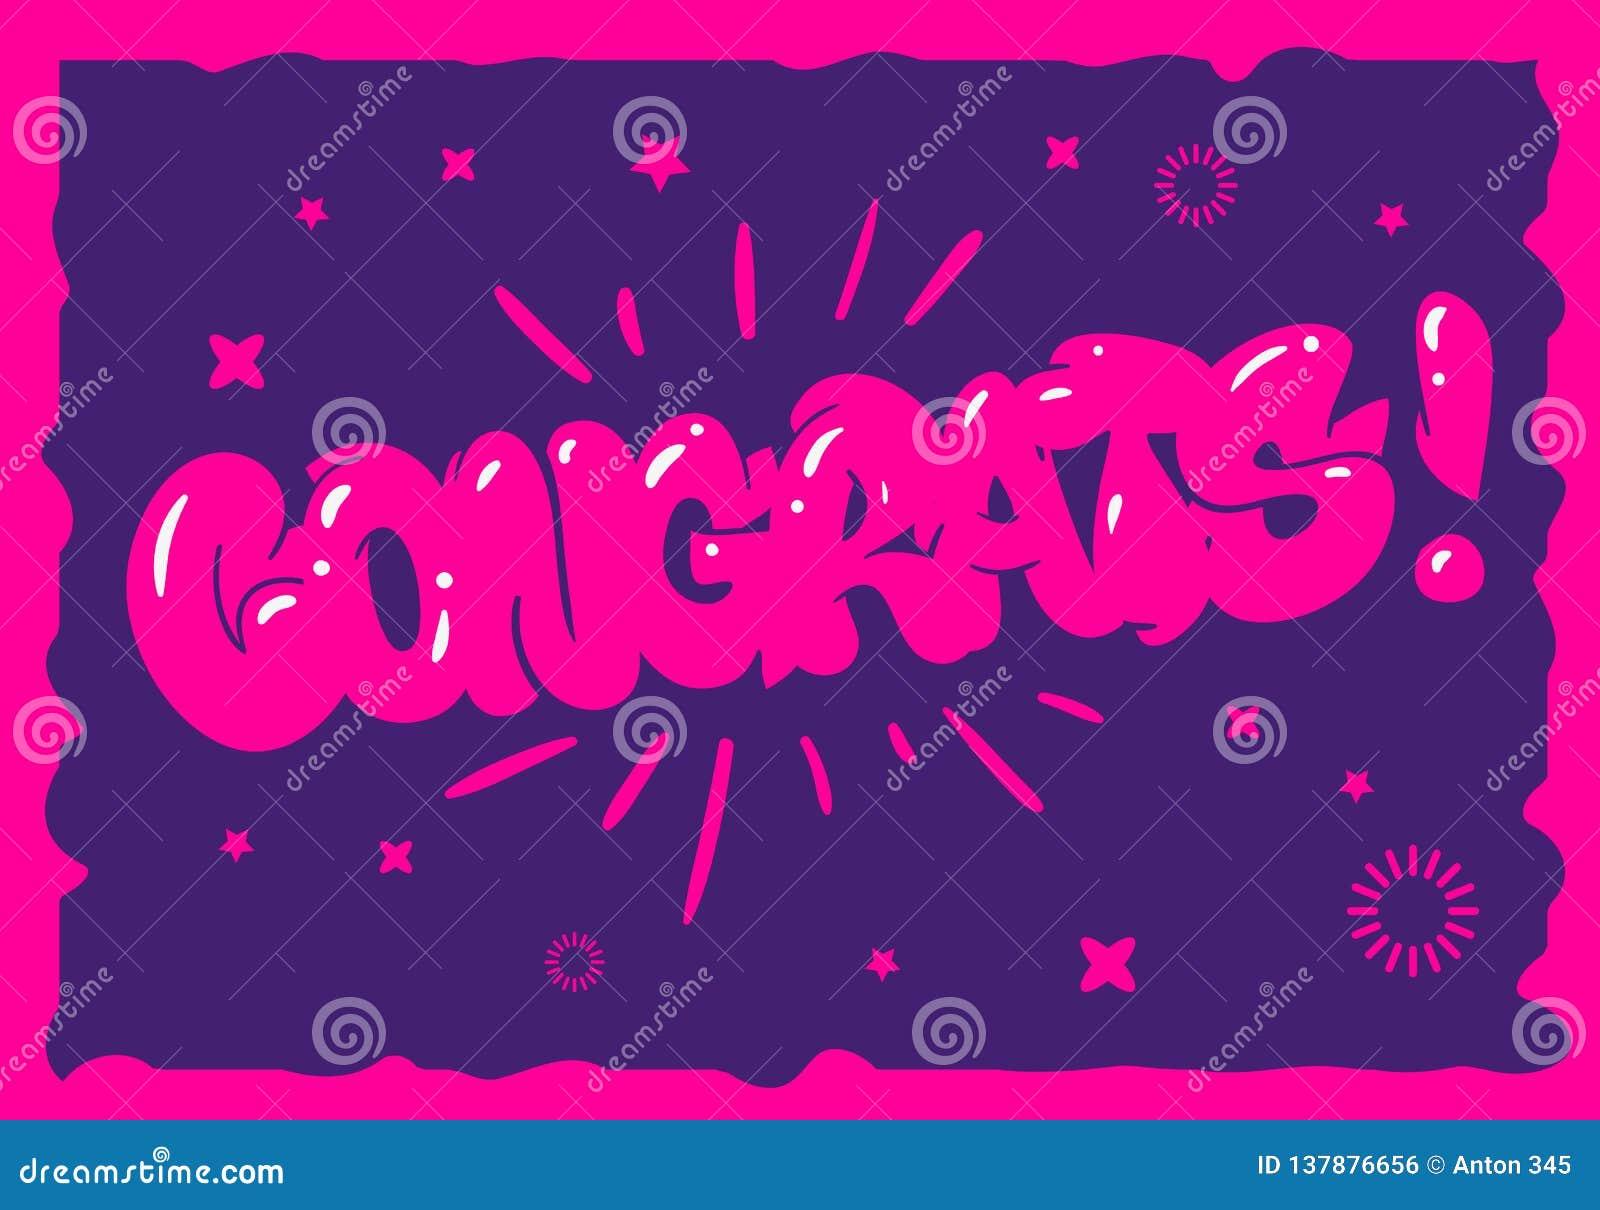 Congratulation Congrats Greeting Card Flyer Poster Hand Drawn